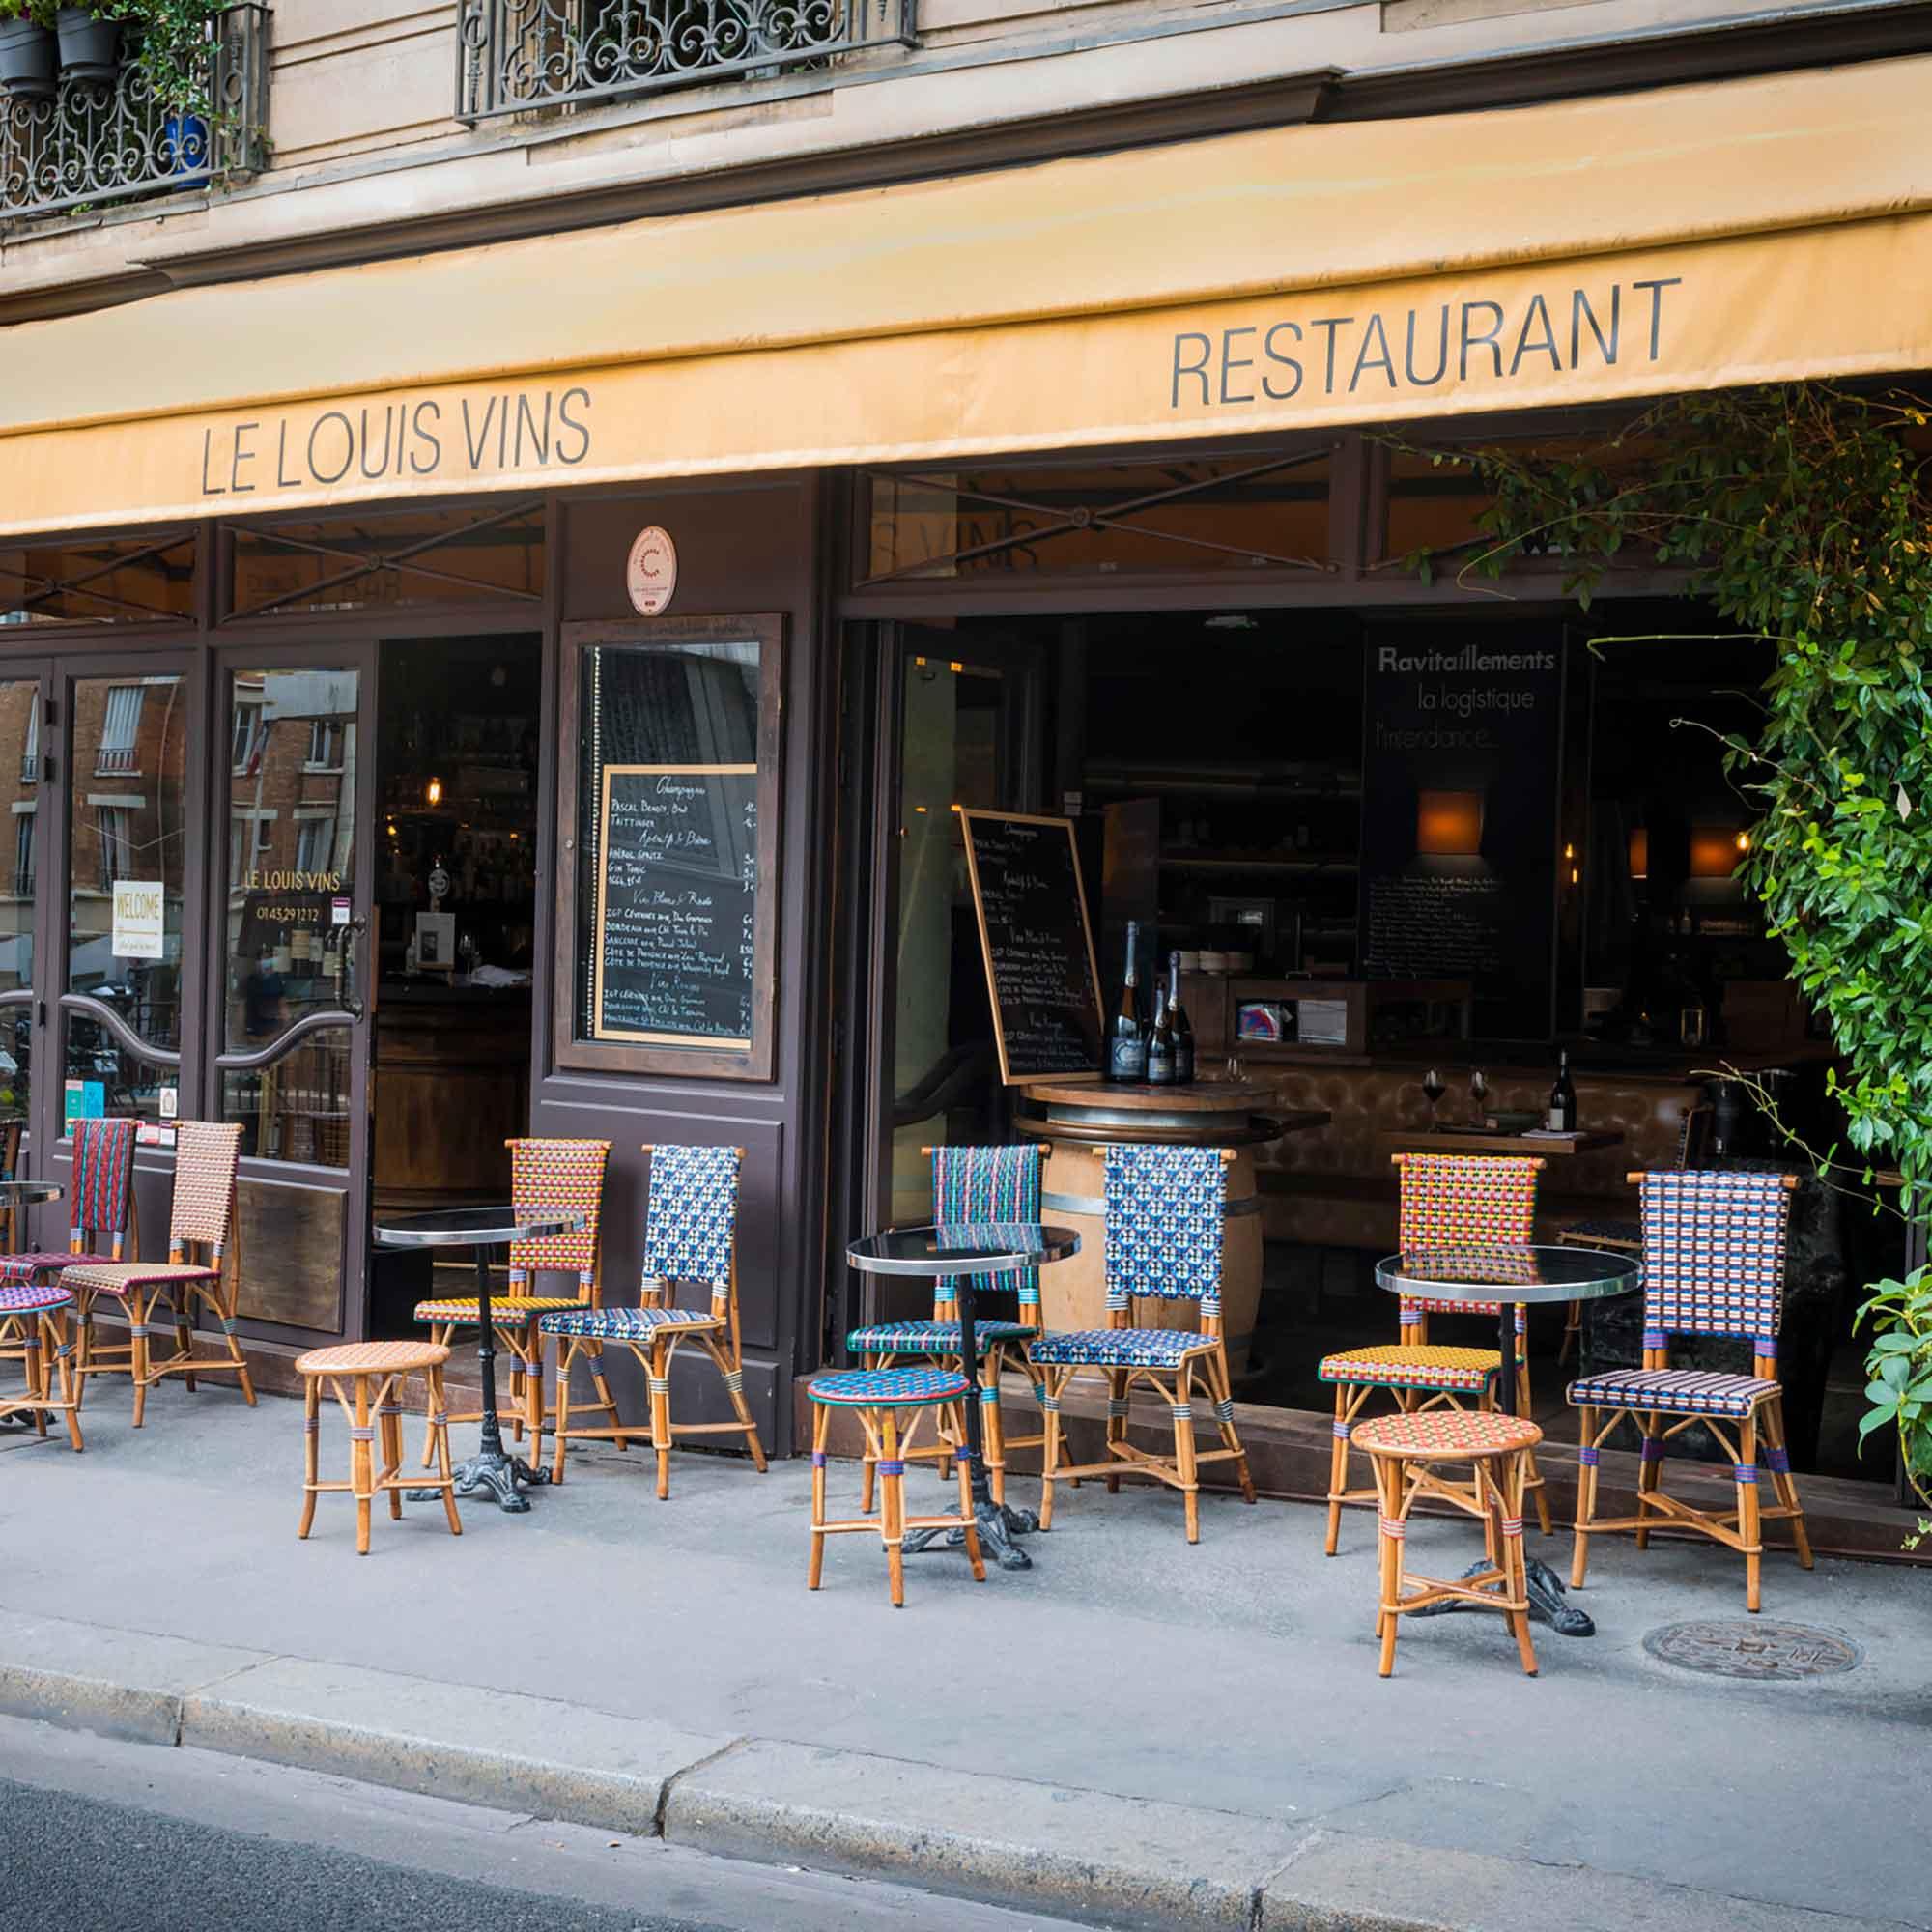 Terrasse restaurant avec chaise et table type bistrot en cannage